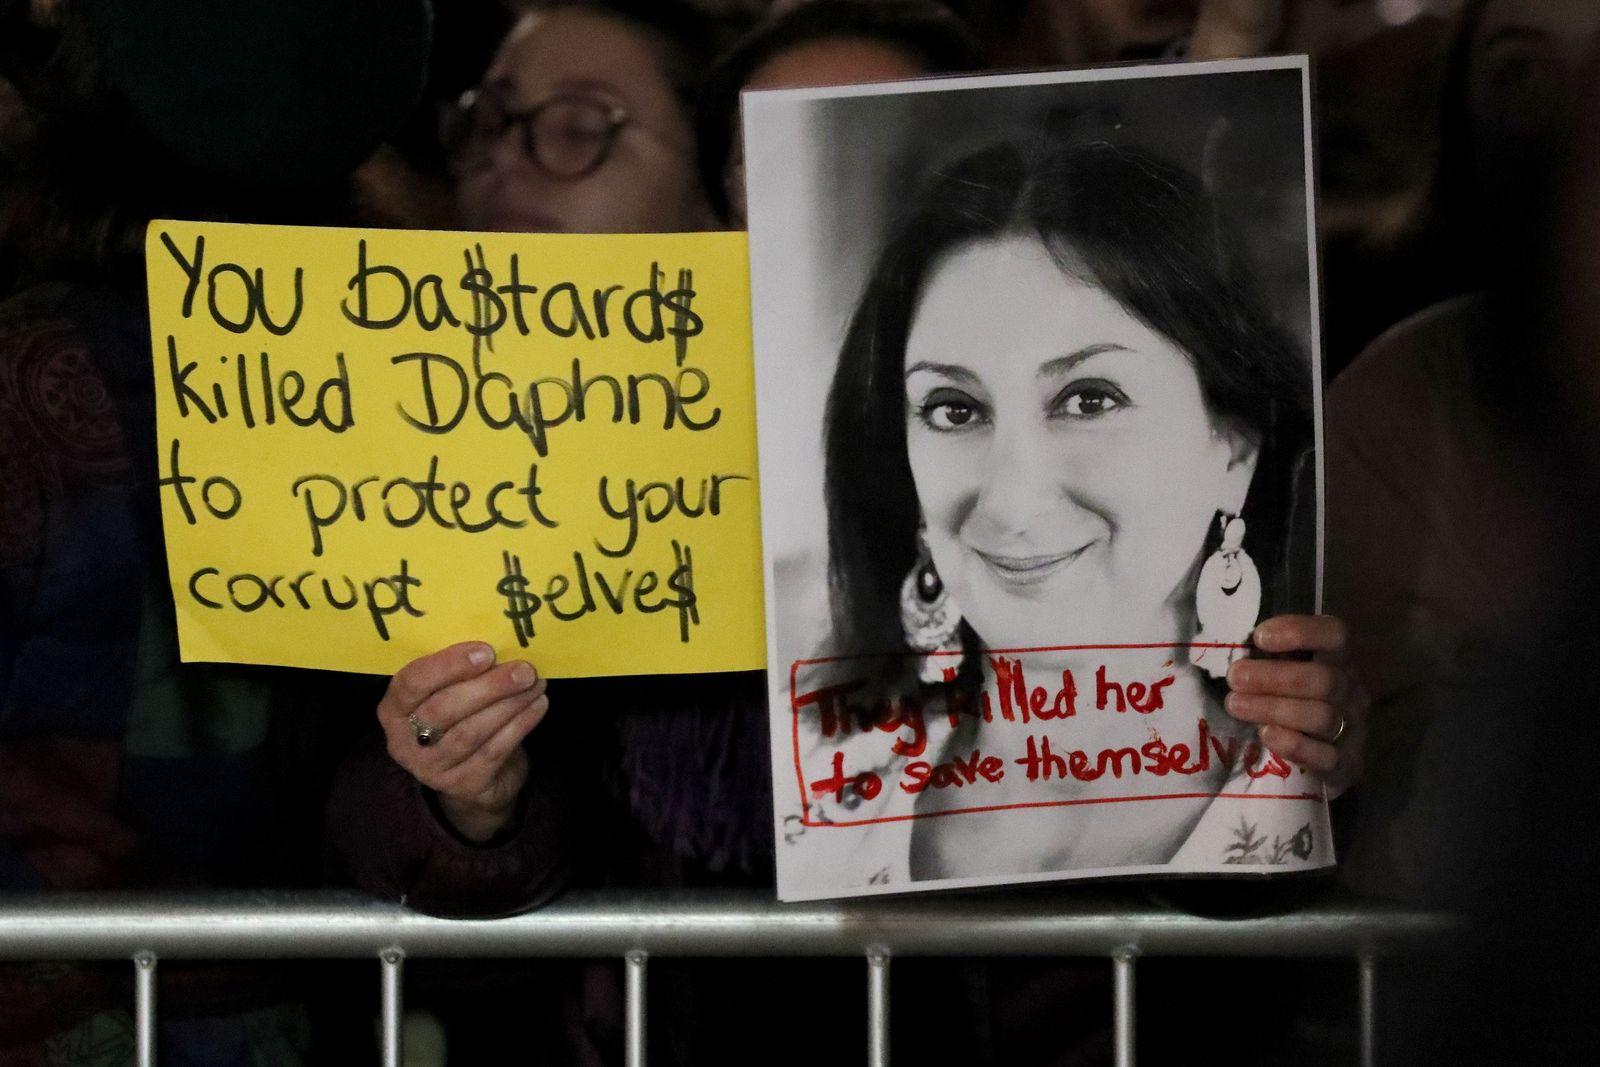 Demo vor dem Parlament in Malta / Daphne Caruana Galizia